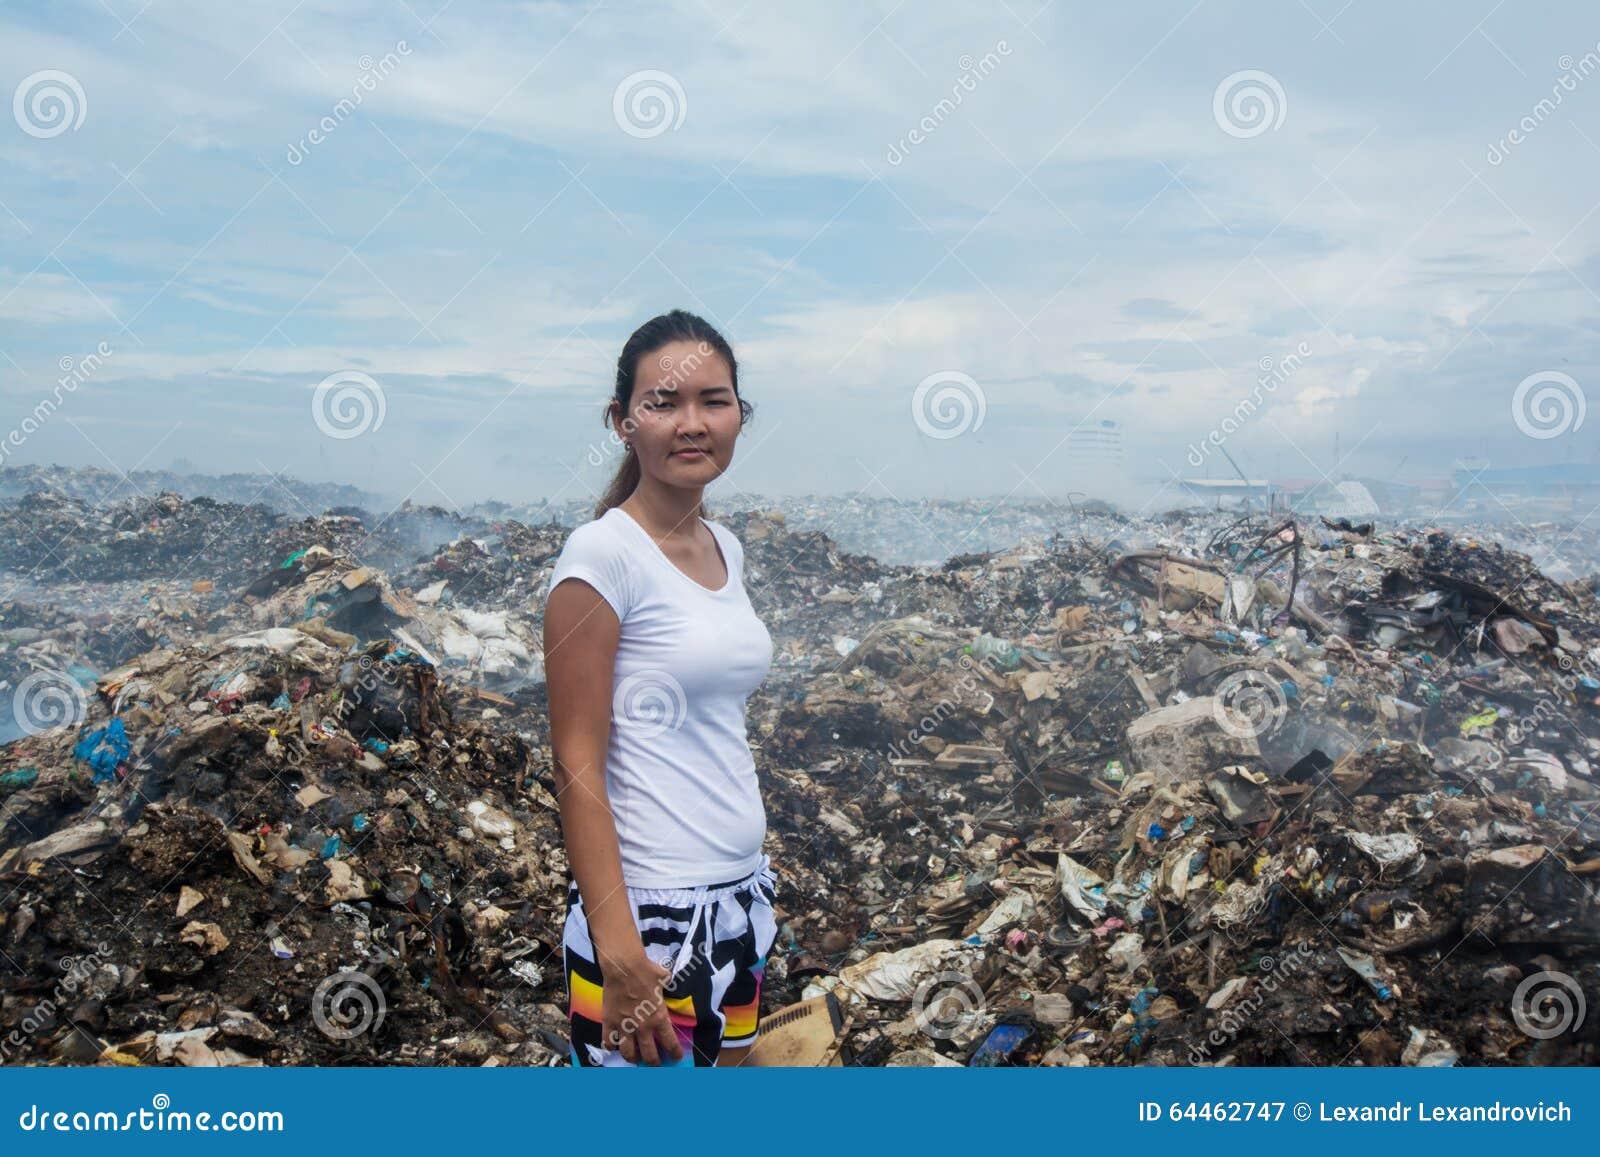 free standing trash